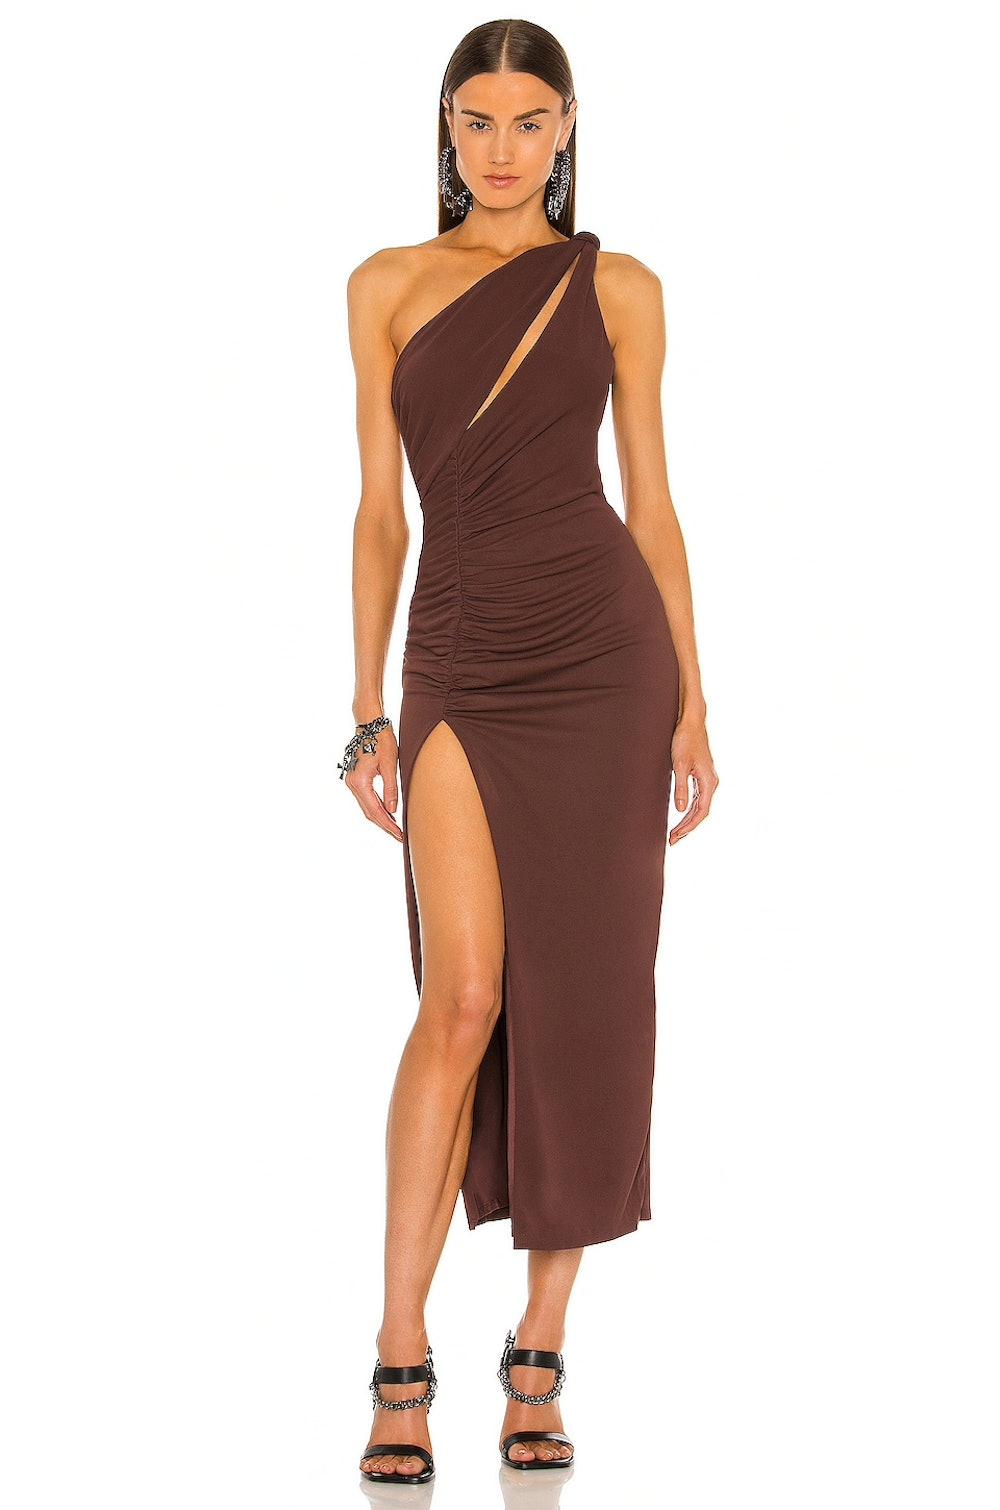 Dundas x Revolve Kate Midi Dress